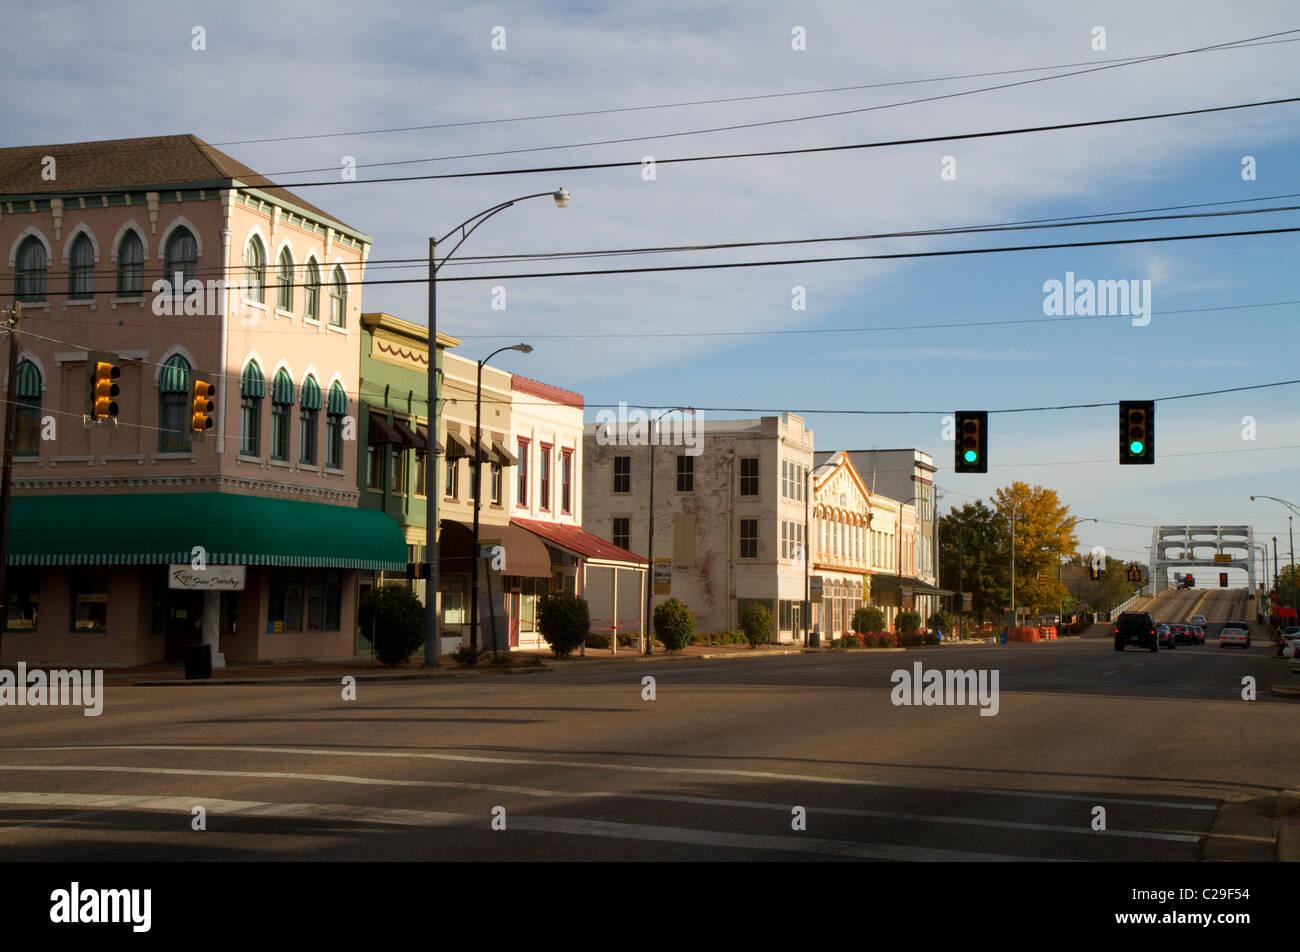 Downtown Selma, Alabama, USA. - Stock Image